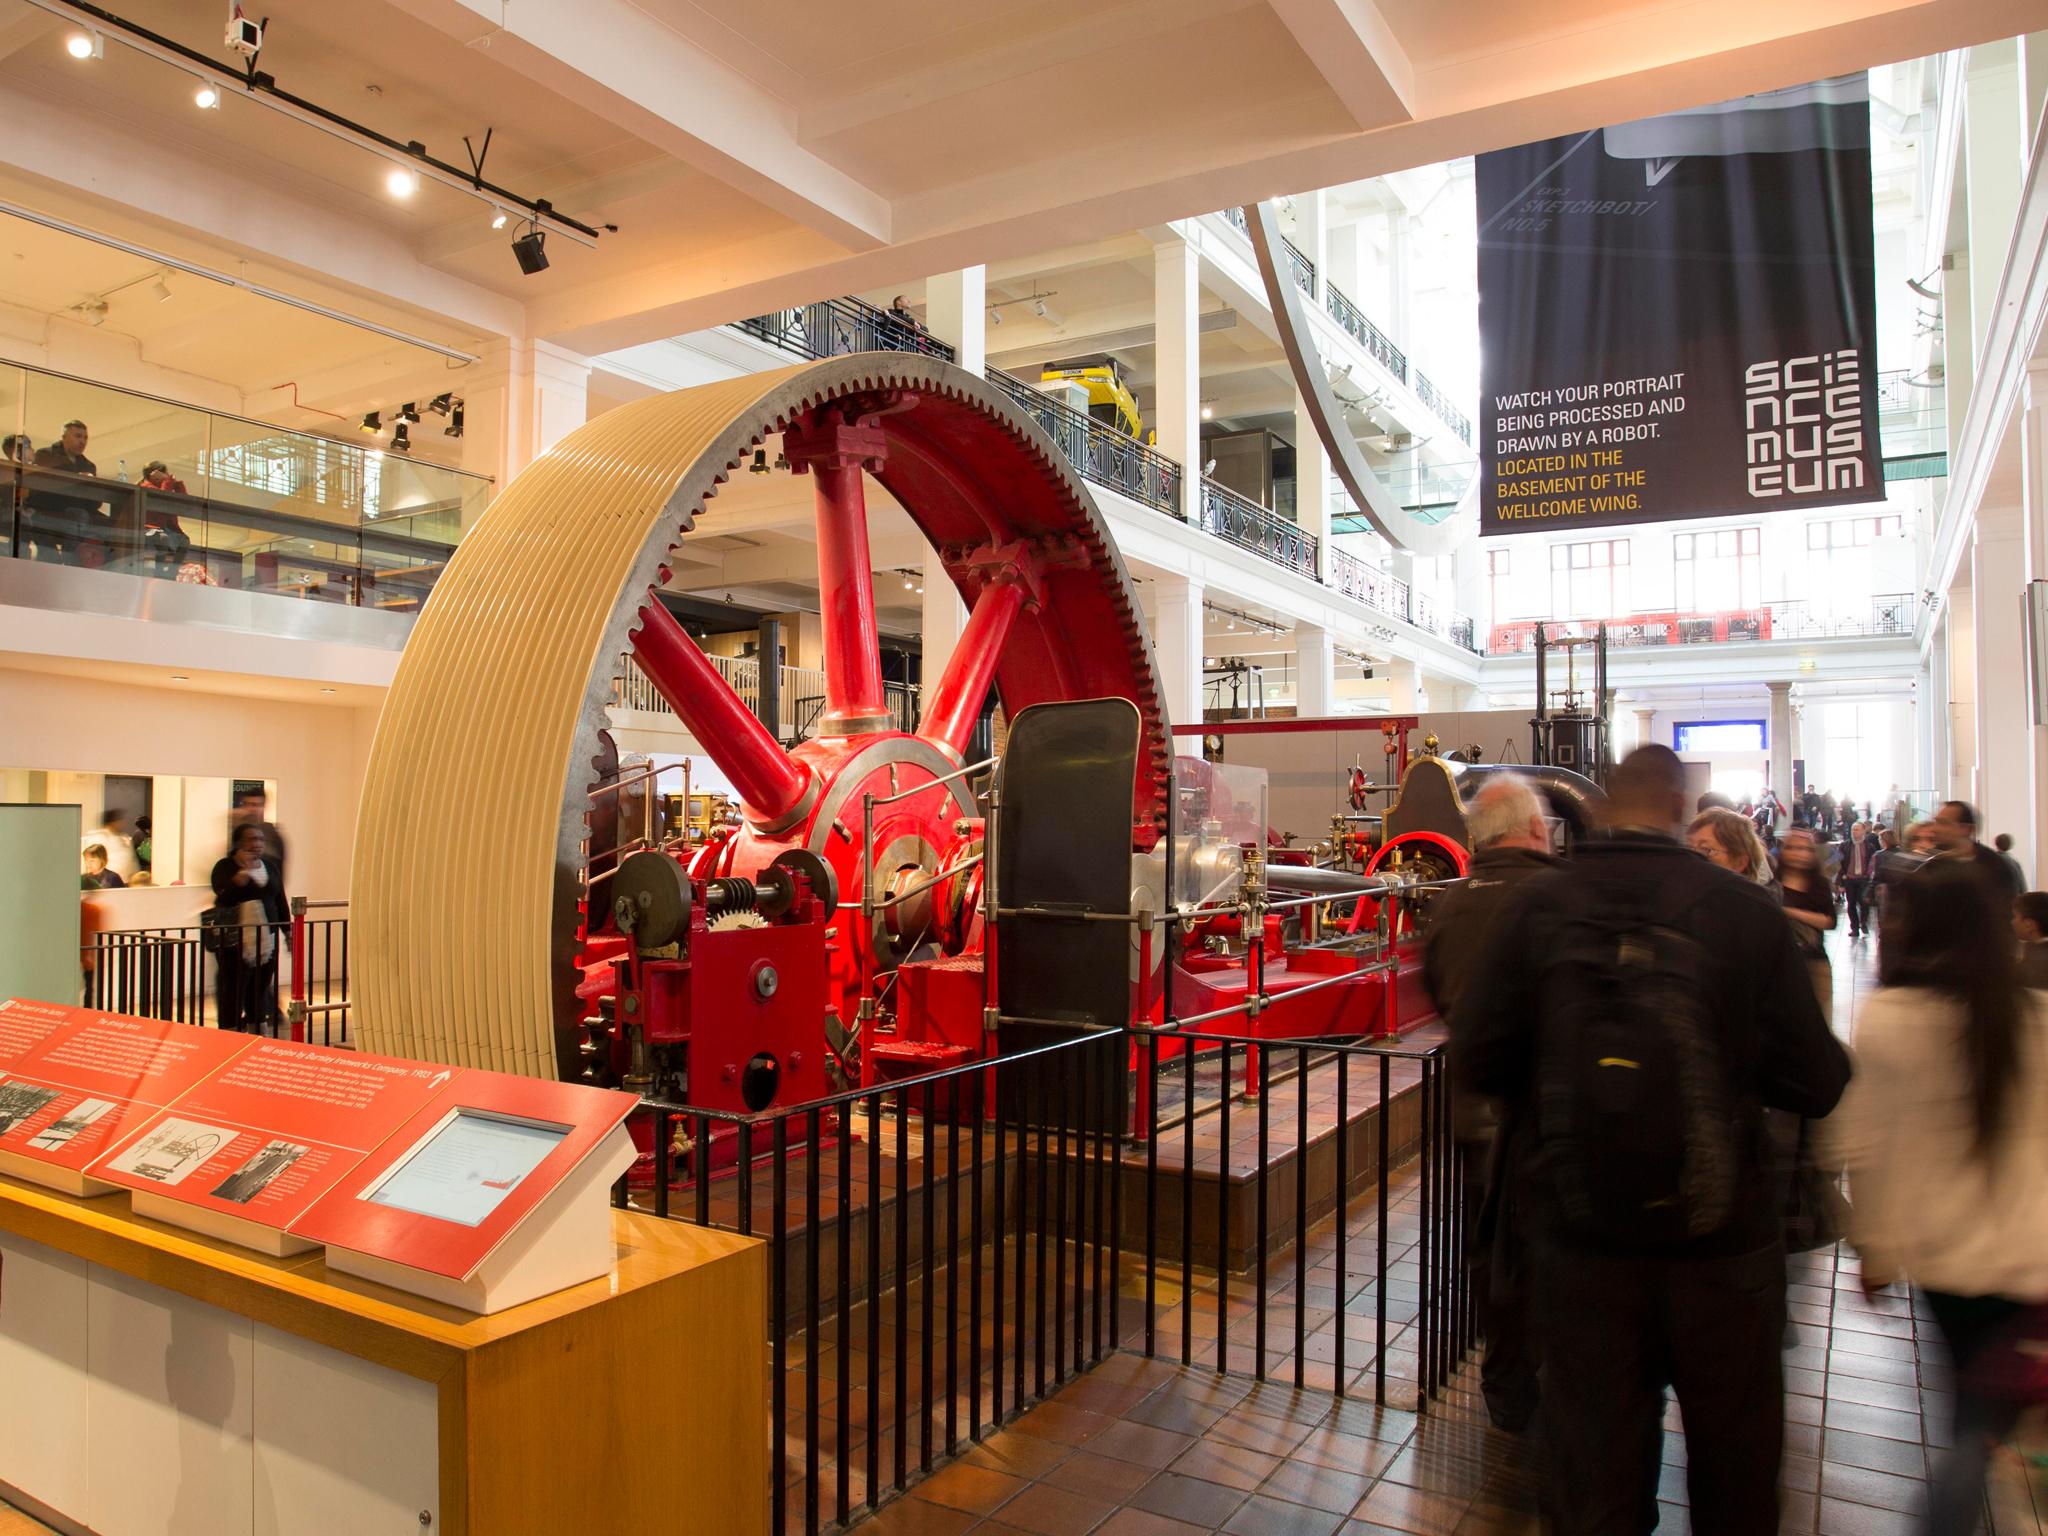 Mill engine, 1903